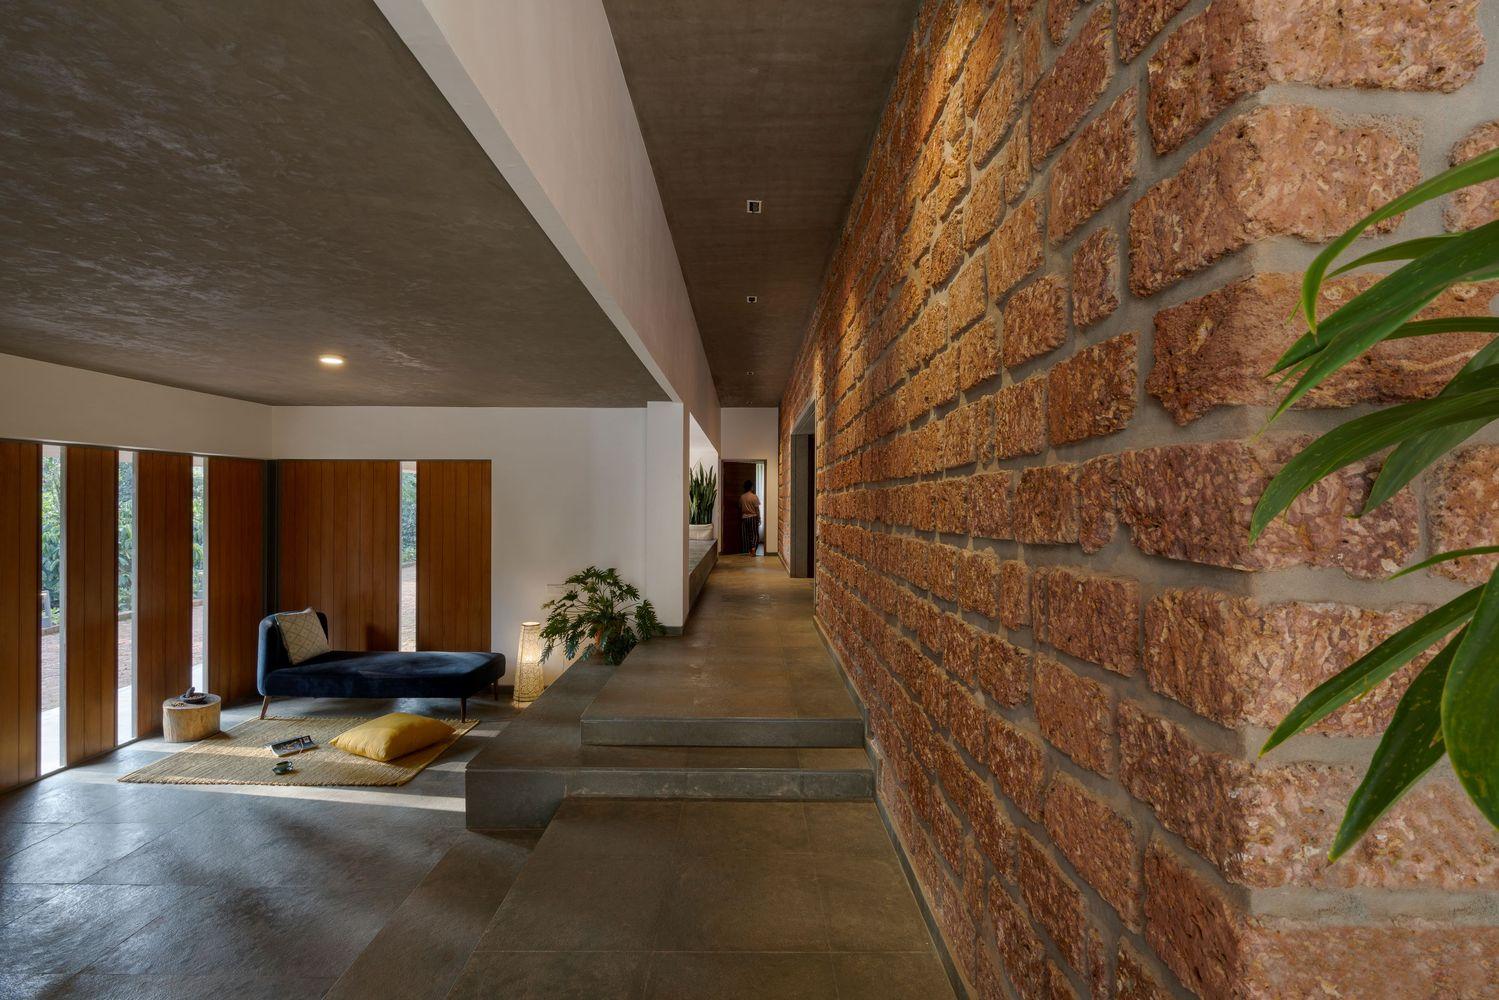 Ovoid House por Greyscale Design Studio 04